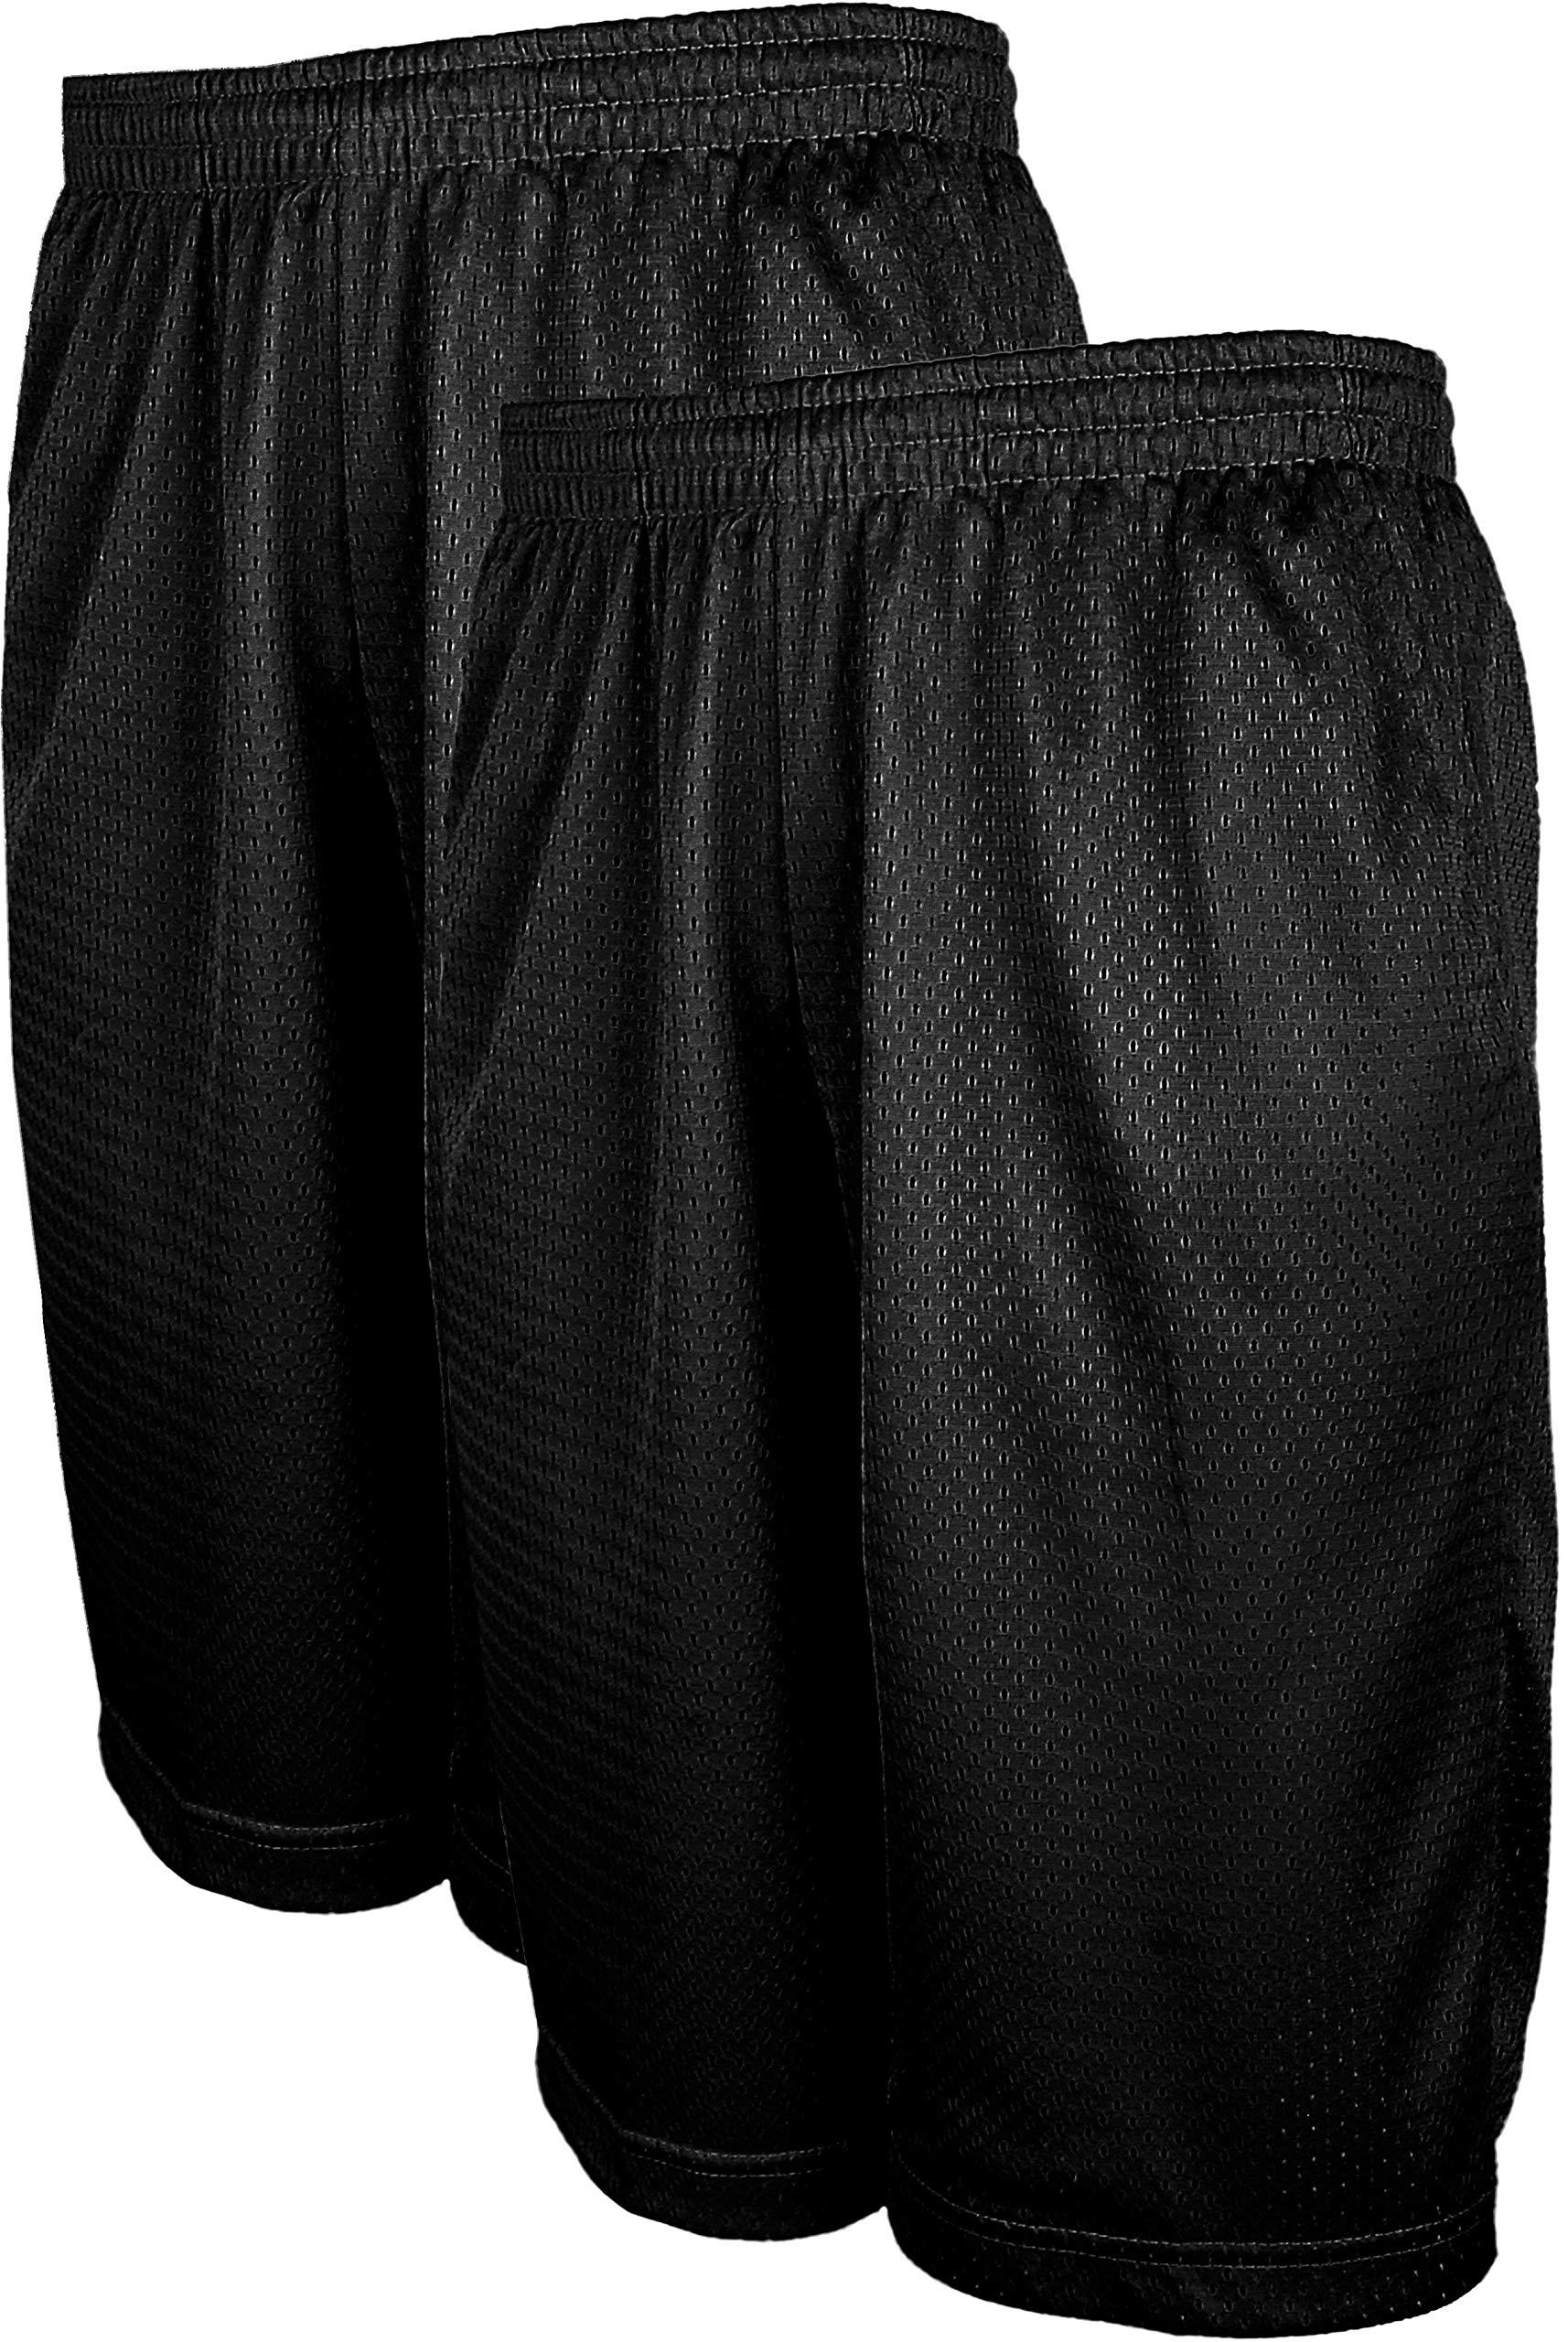 ViiViiKay Men's Athletic Basketball Shorts - Mesh Workout Gym Shorts with Pocket SET2_BK_BK 2XL